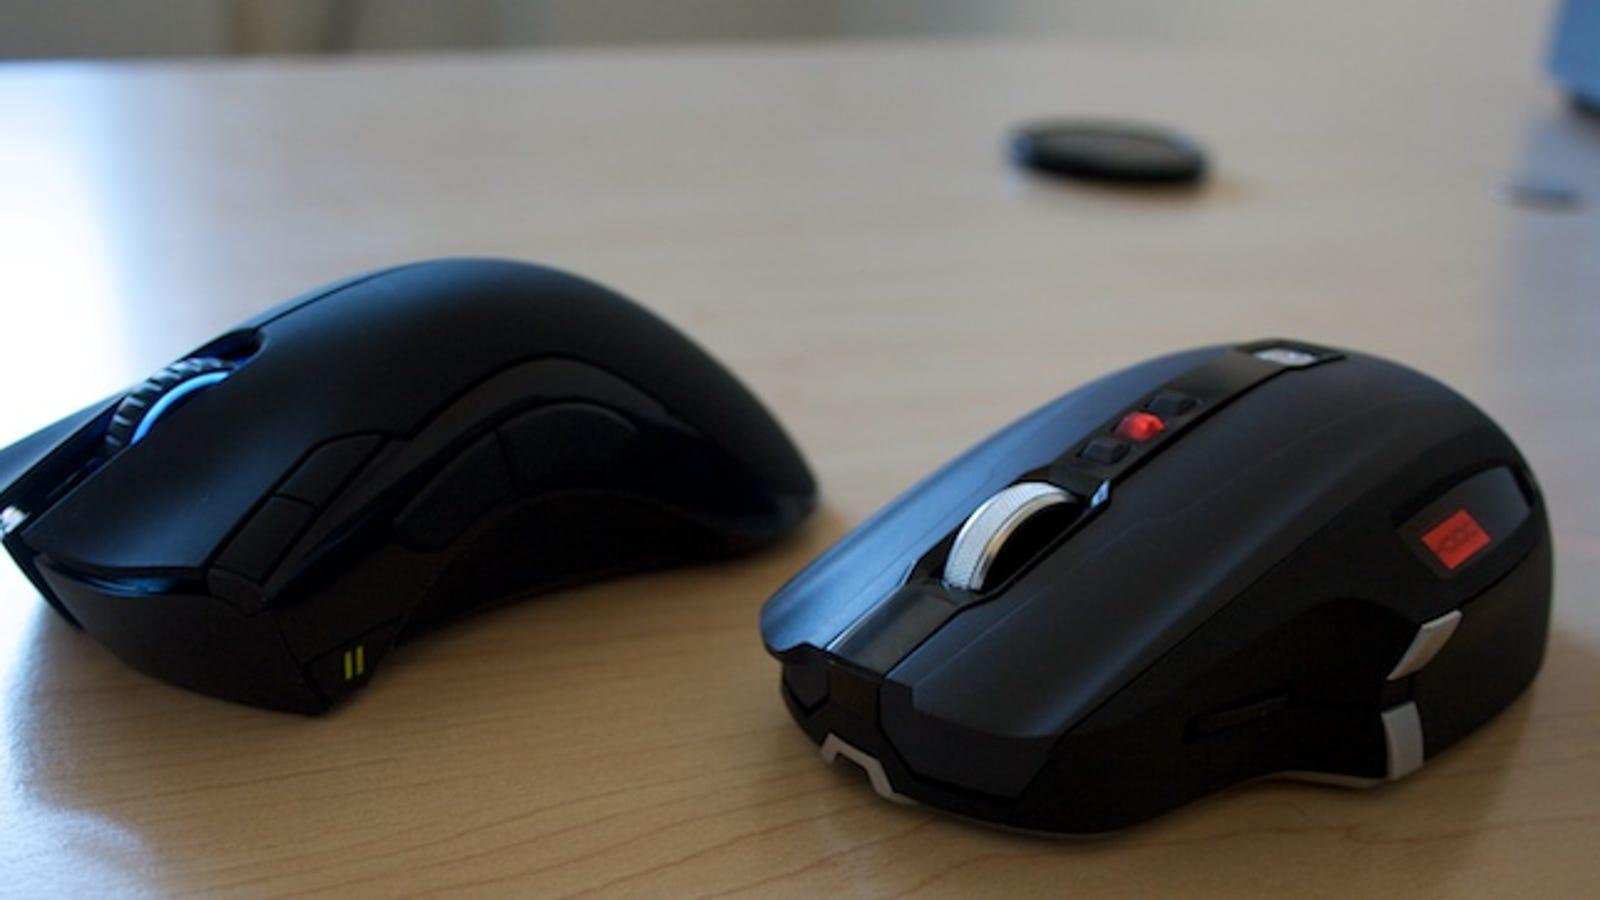 fd5bea6b949 Razer Mamba vs. SideWinder X8: Wireless Gaming Mice Review